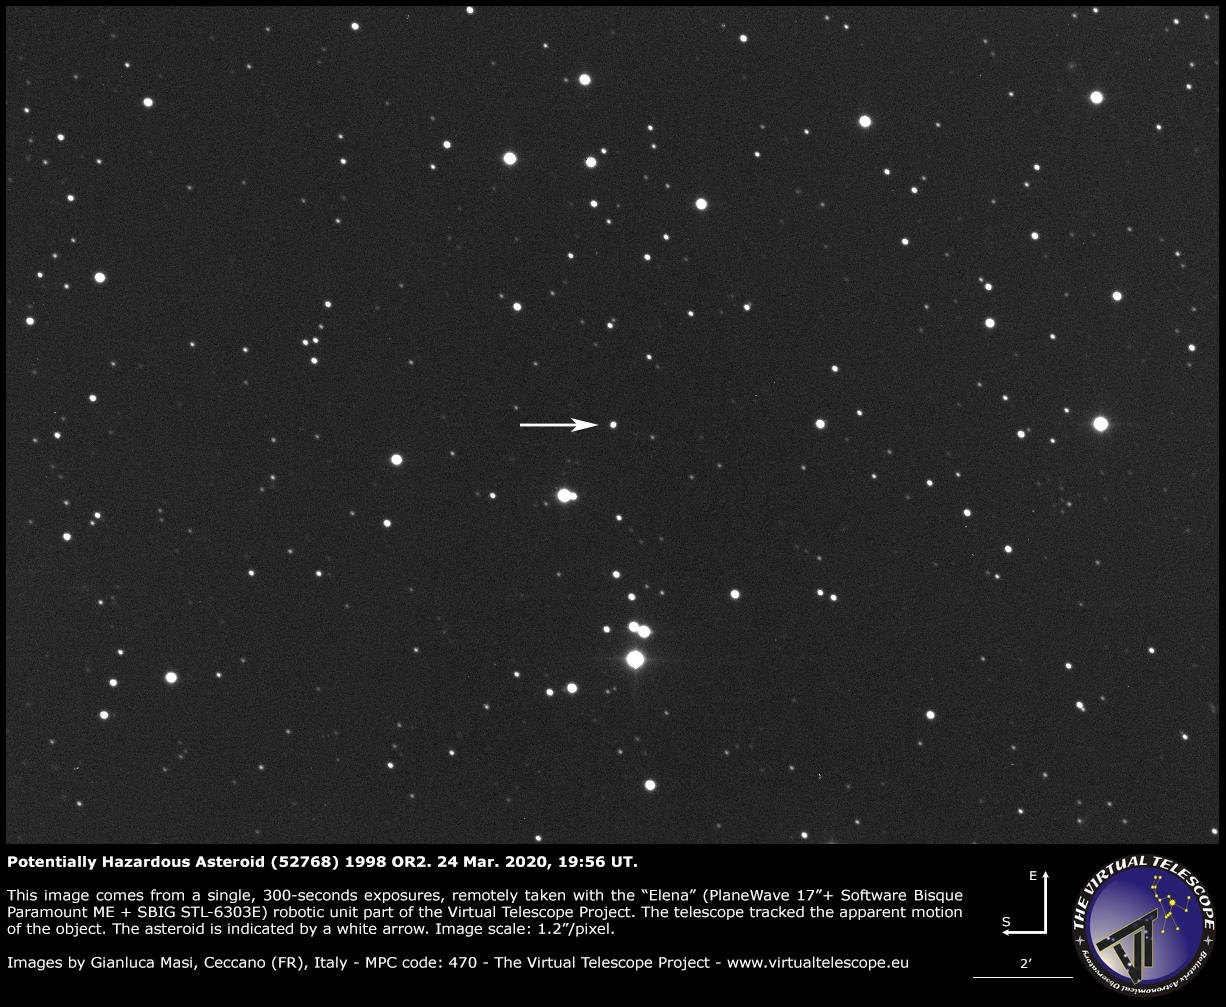 Potentially Hazardous Asteroid (52768) 1998 OR2: a image - 24 Mar. 2020